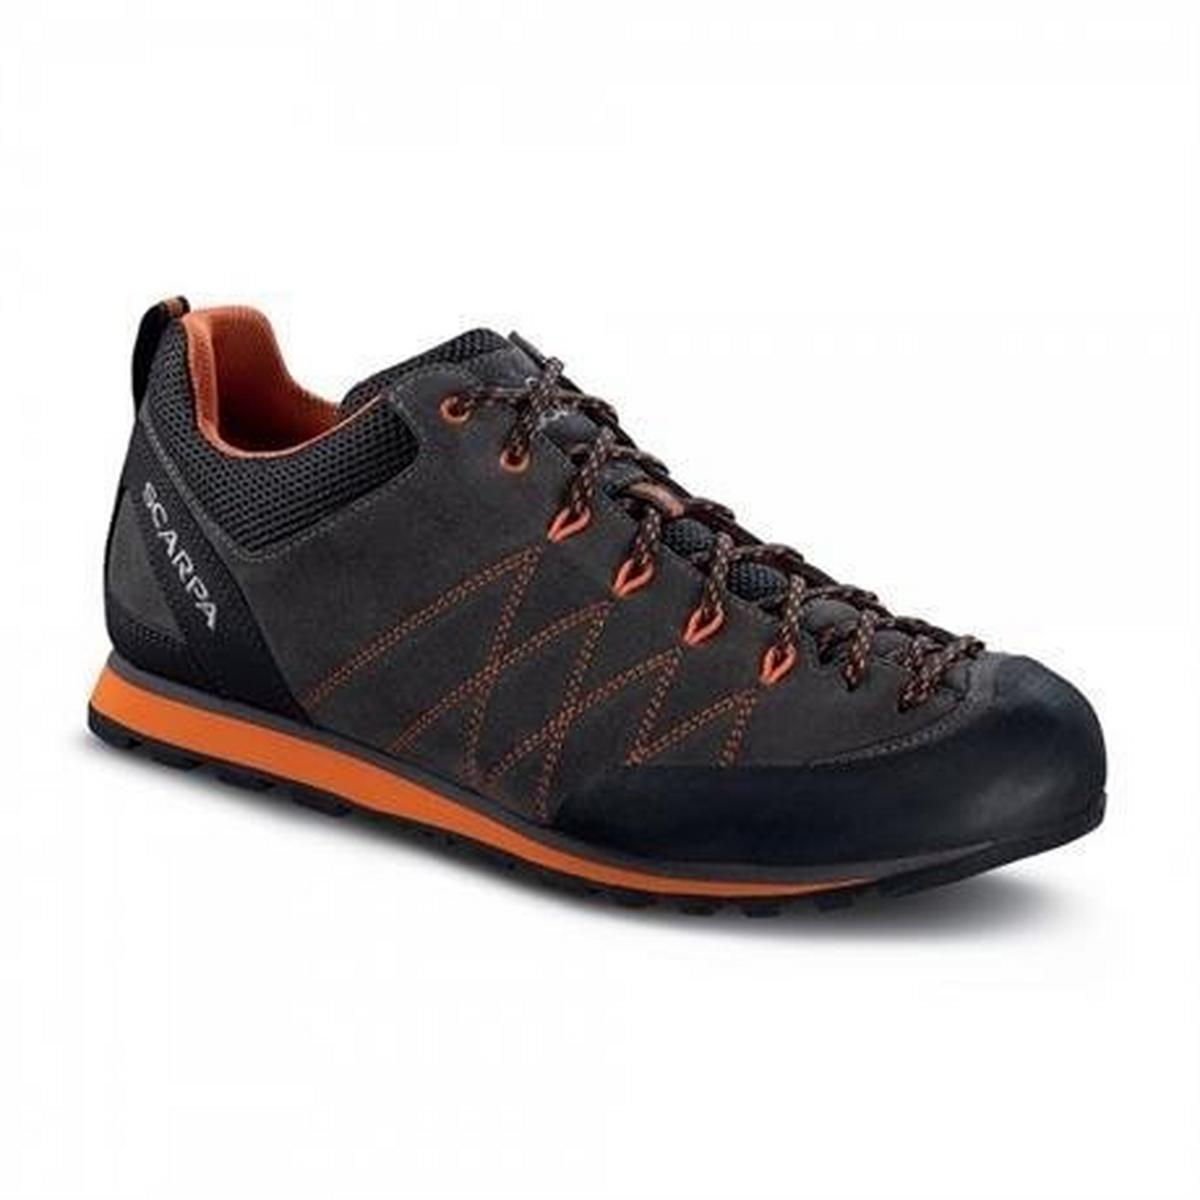 Scarpa Approach Shoes Men's Crux Shark/Tonic